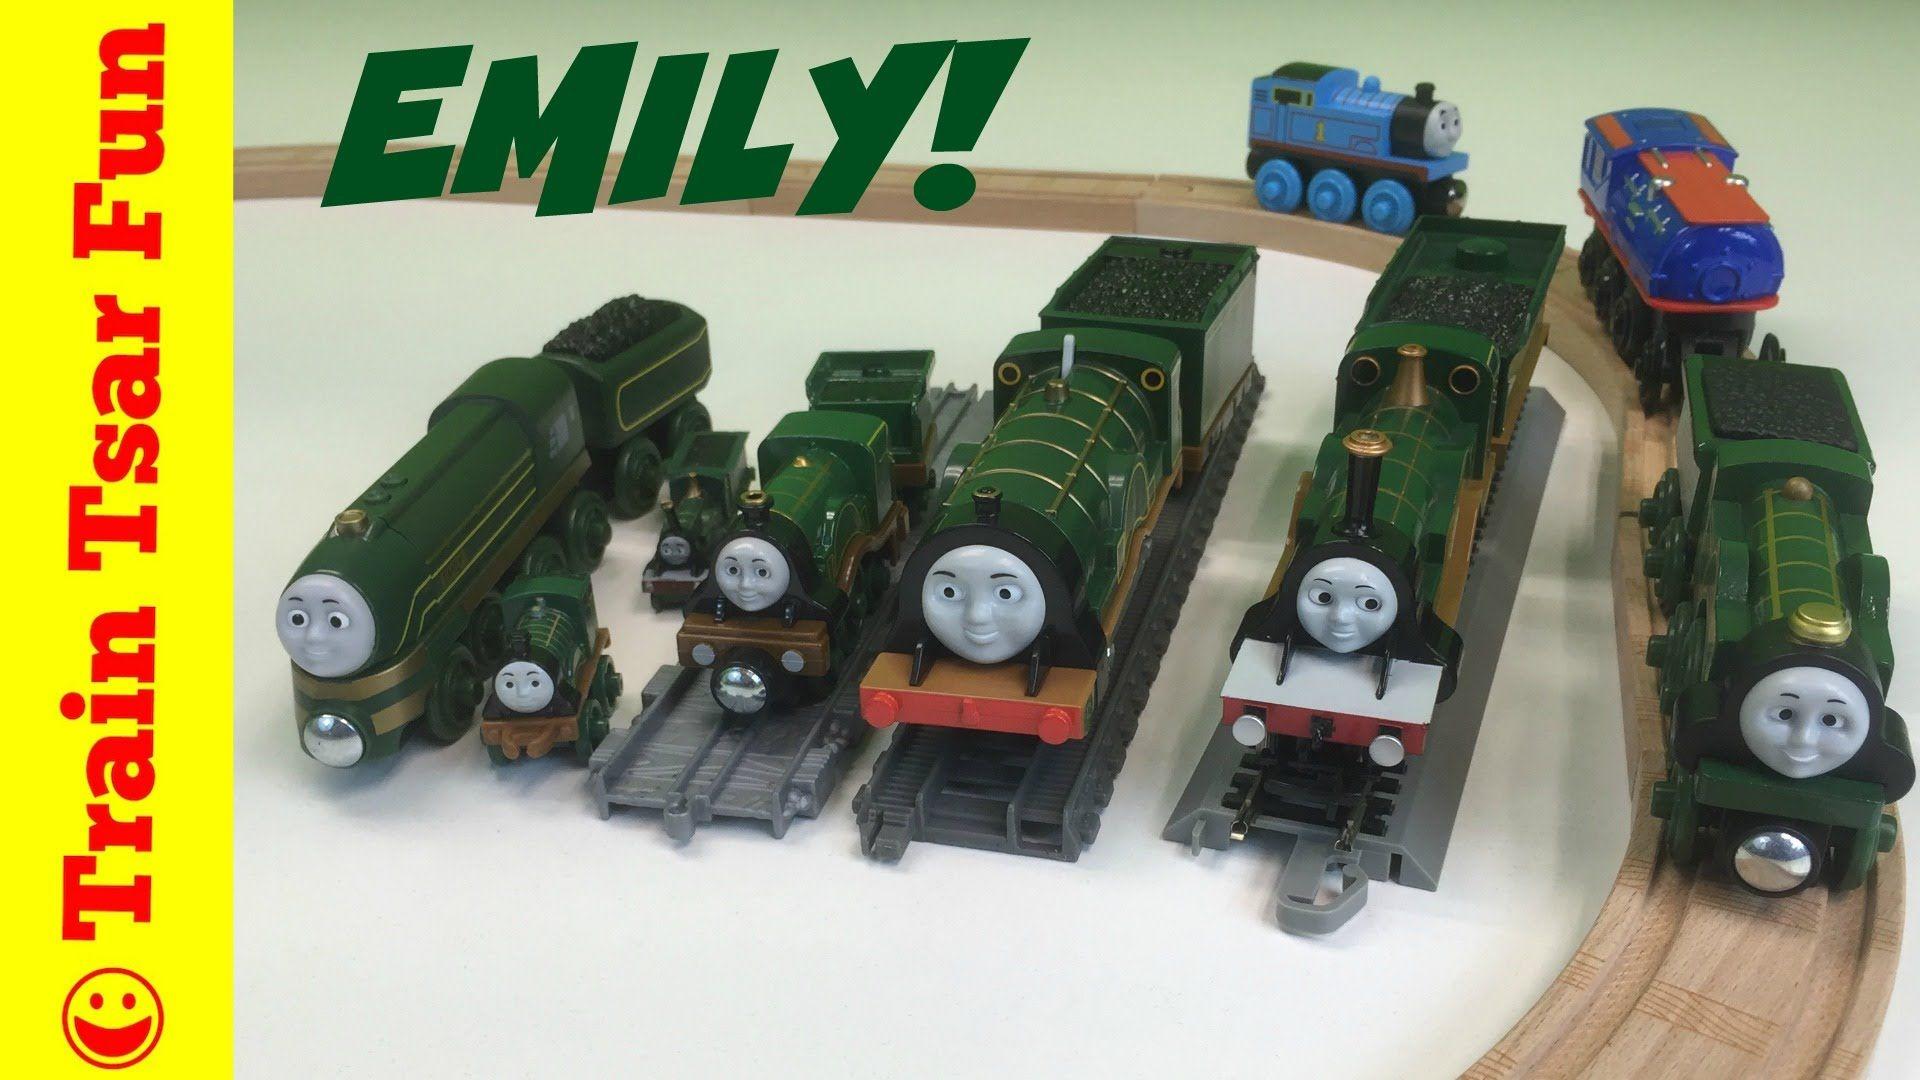 Emily Locomotive Collection Thomas Friends Trains Streamlined Emily Thomas And Friends Thomas And Friends Trains Thomas The Tank Engine